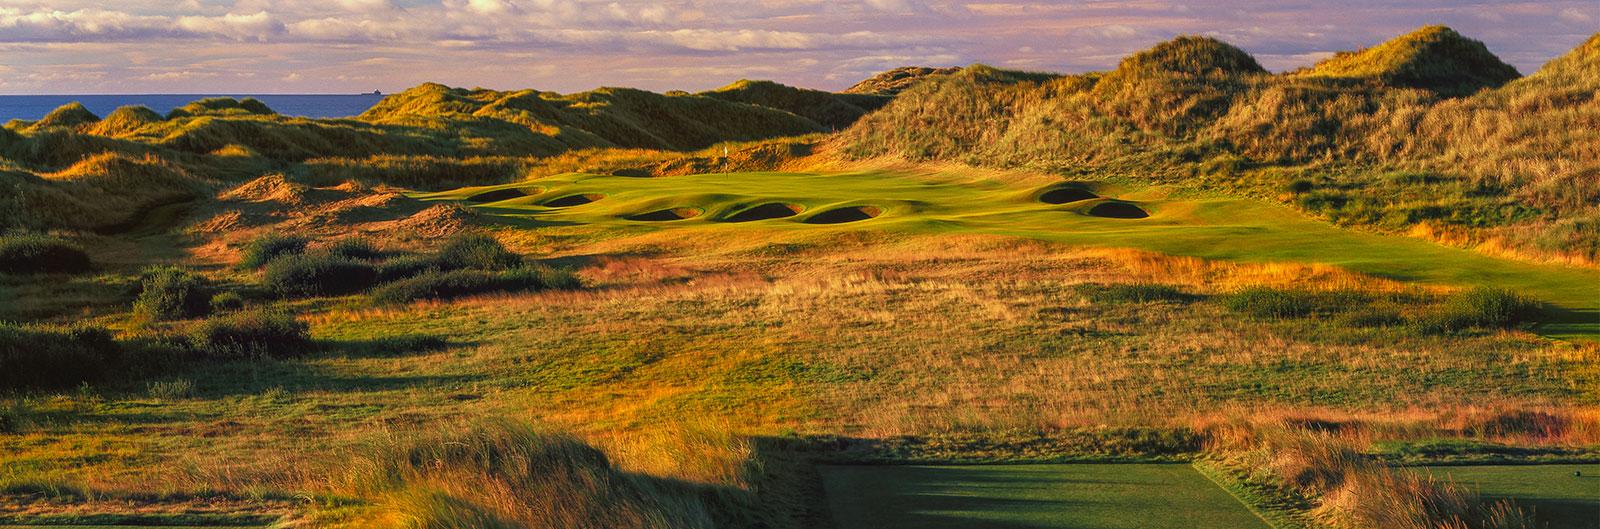 trump-golf-links-scotland